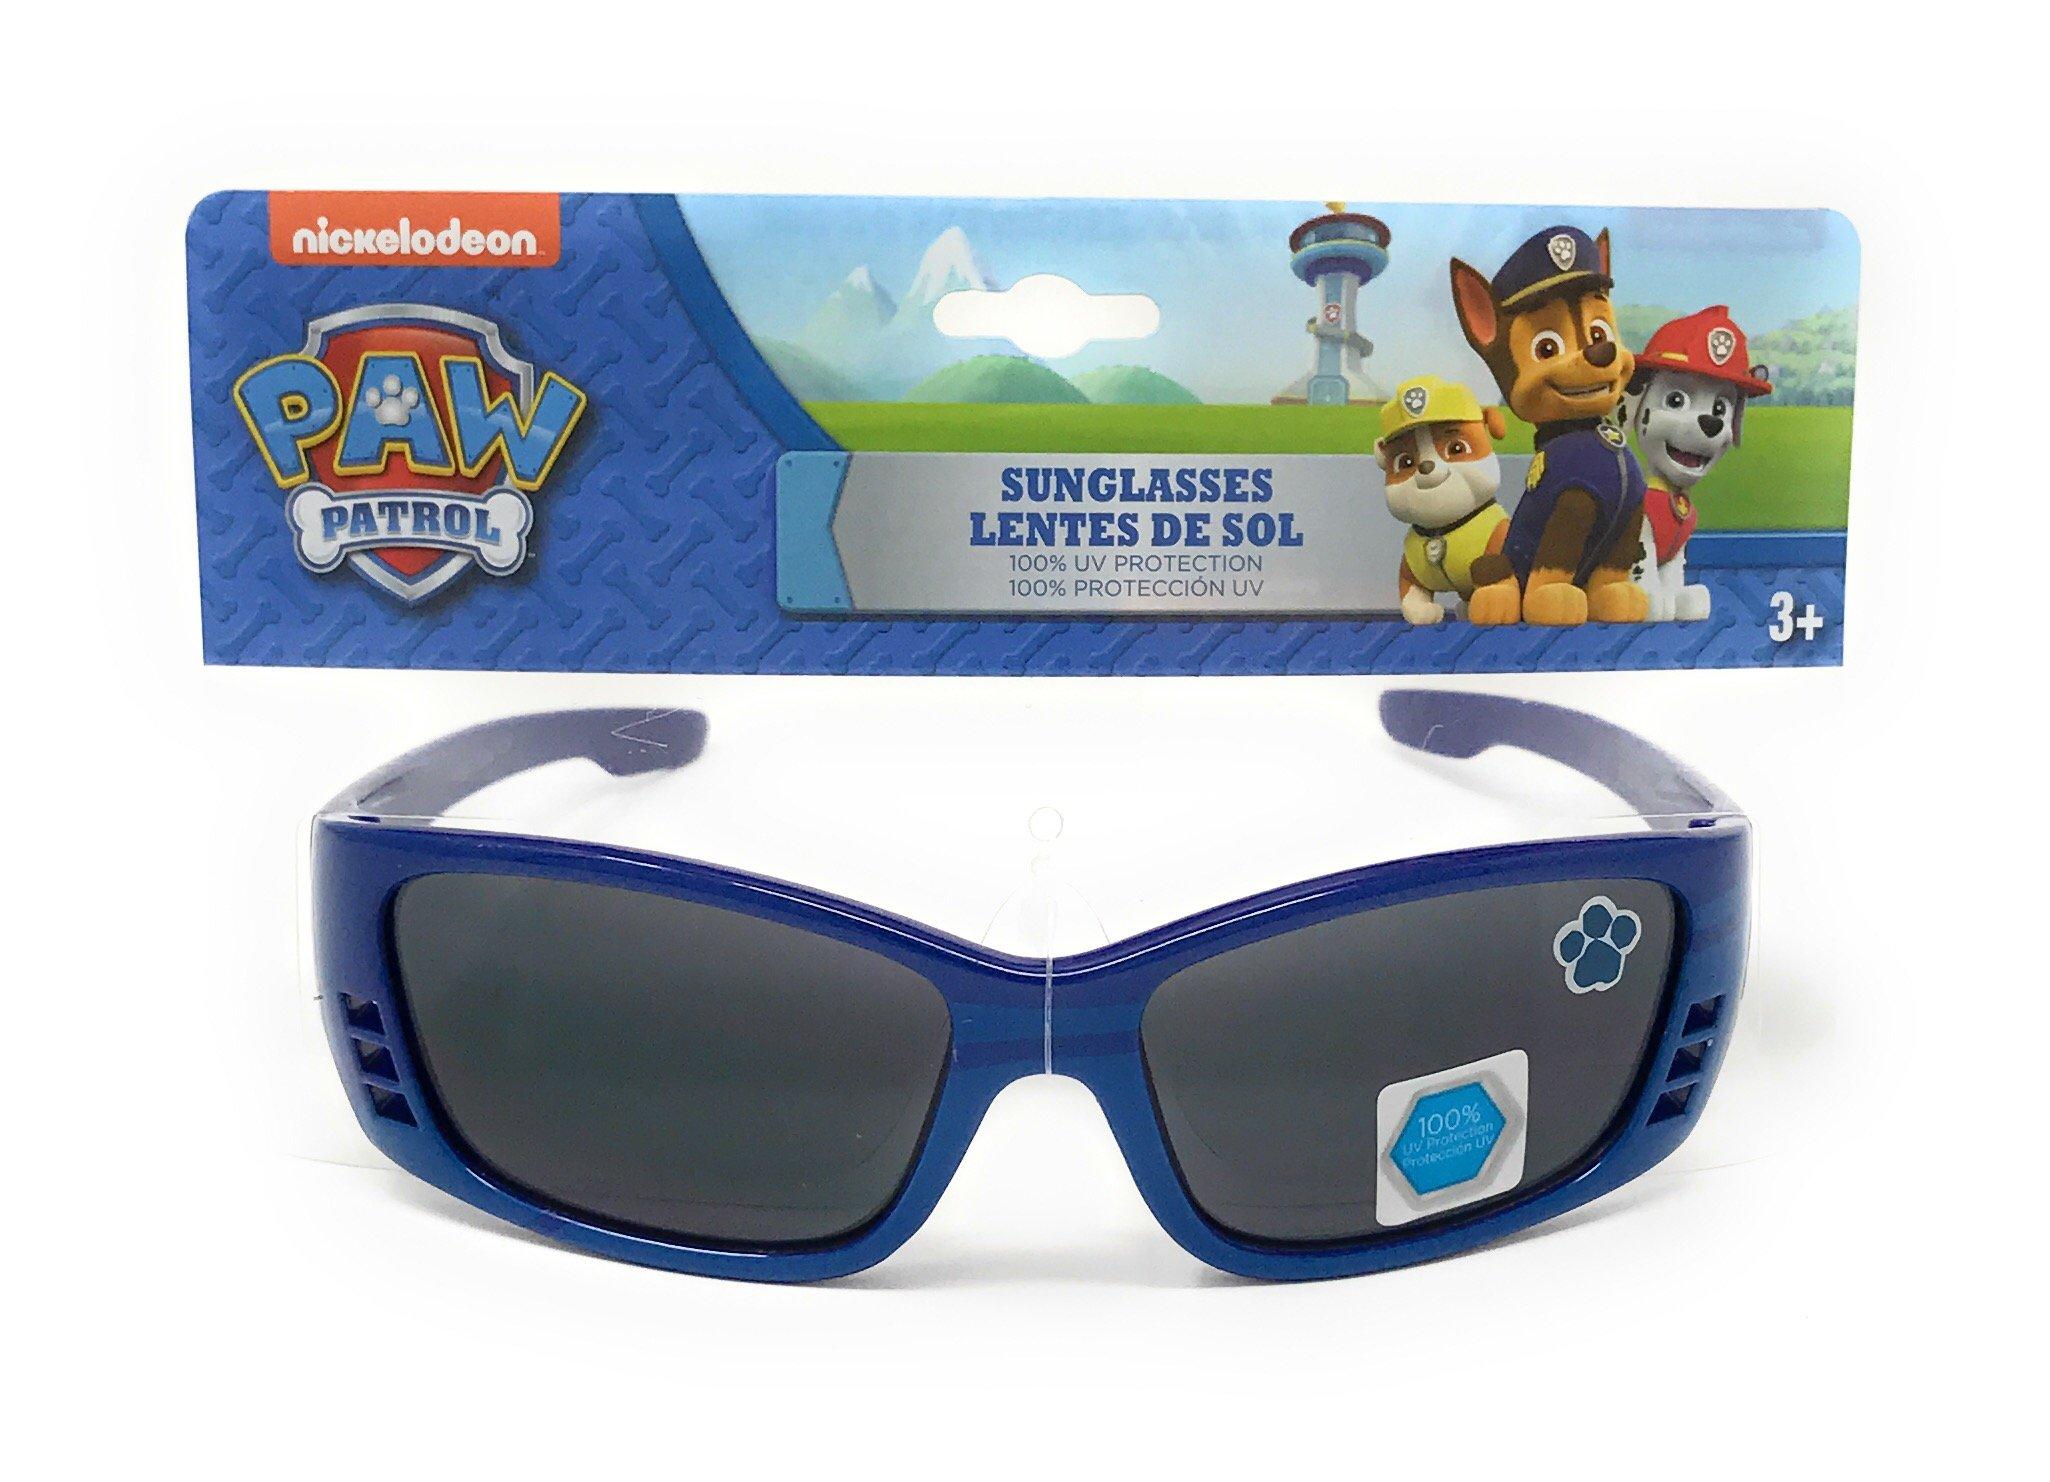 Nickelodeon Paw Patrol ''Paw'' Kid's Sunglasses - 100% UV Protection